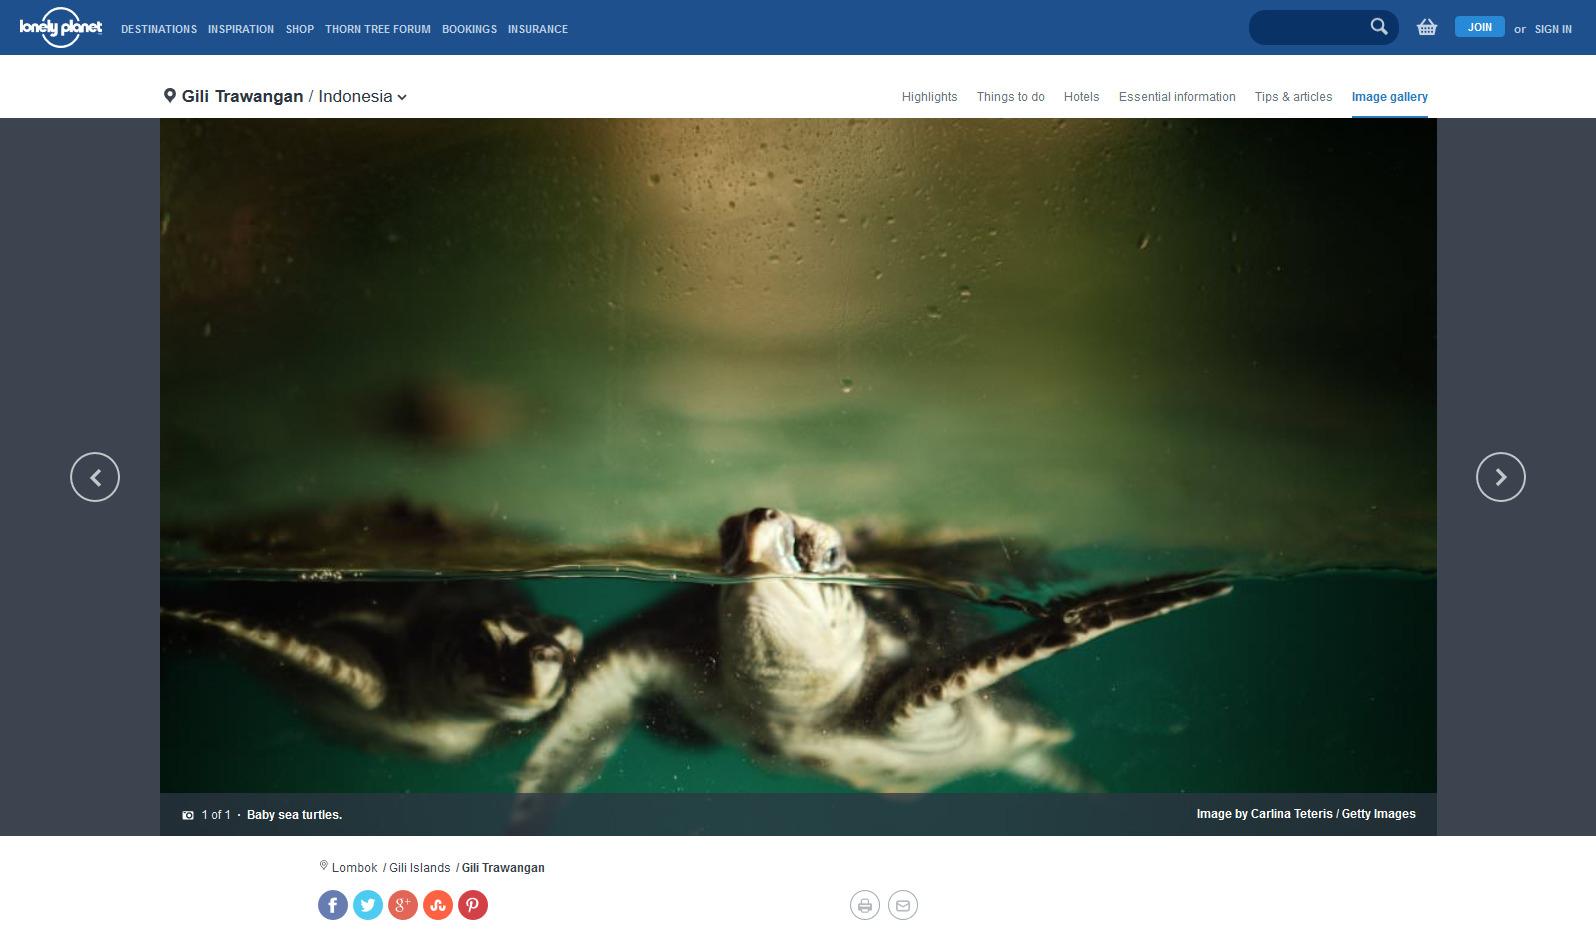 Gili Islands, Gili Trawangan image gallery - Lonely Planet 2016-01-11 20-10-01 copy.jpg